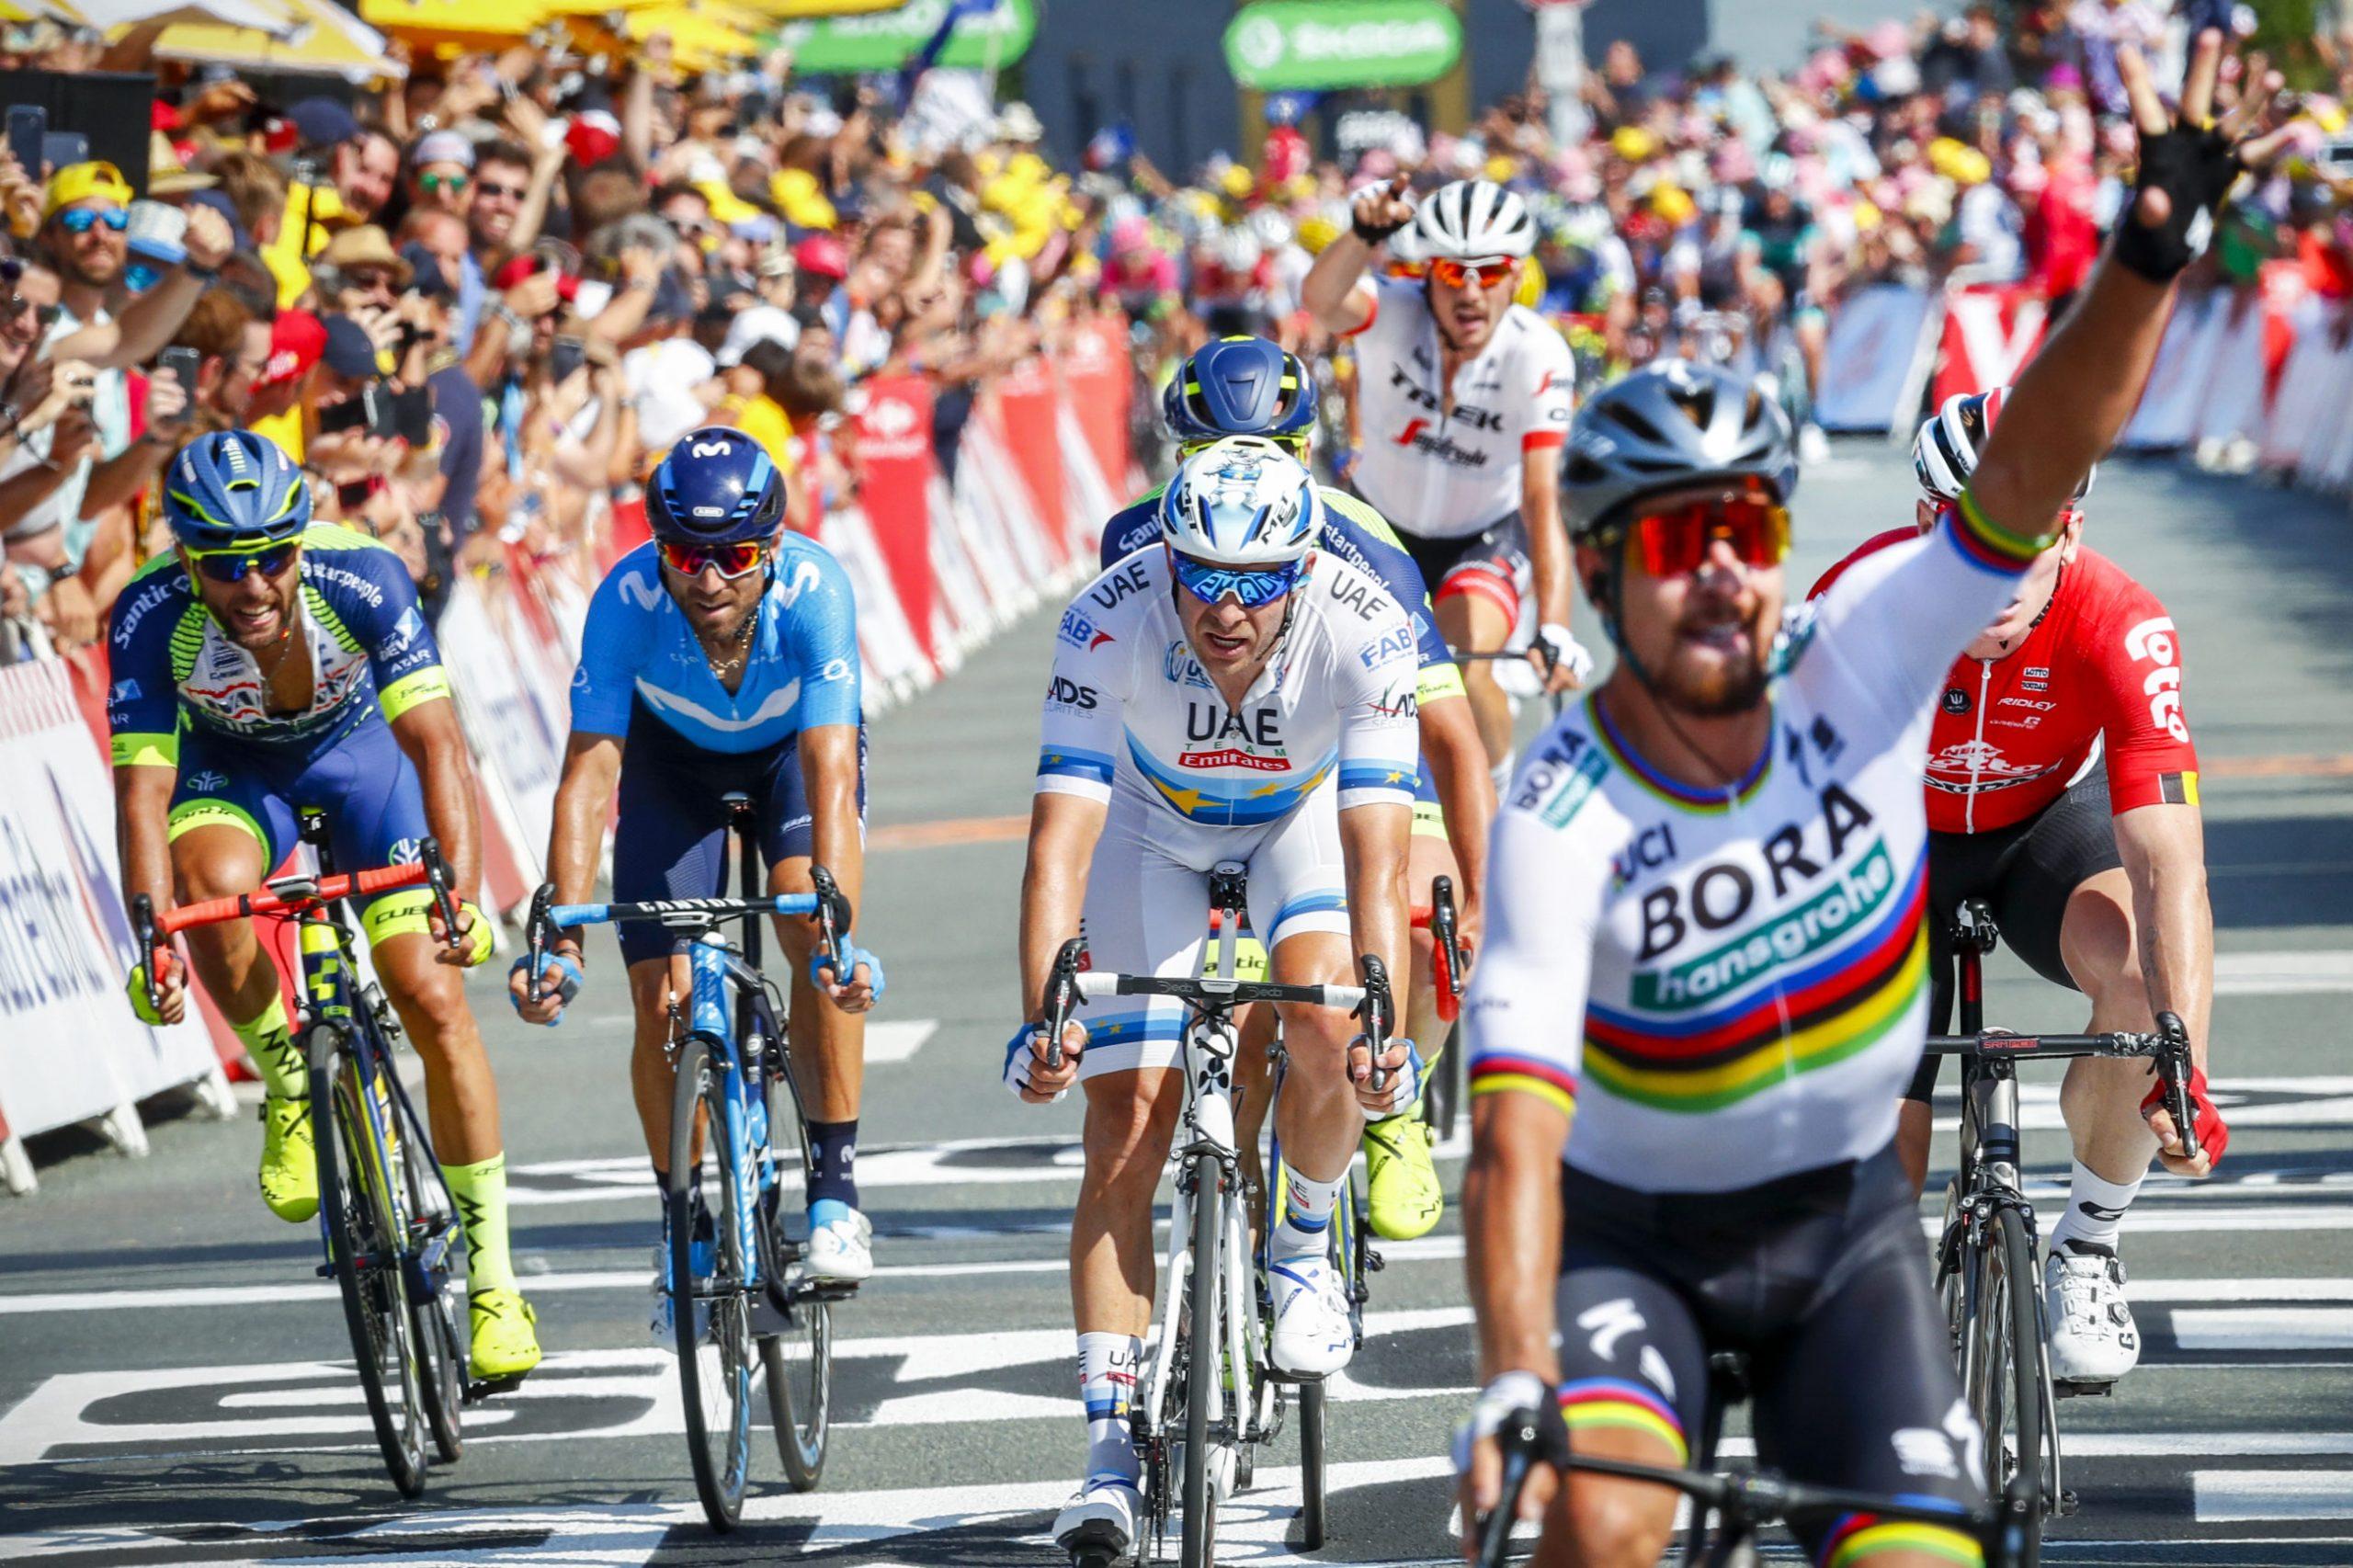 Kristoff slipper Sagan-konkurranse i Flandern og Roubaix